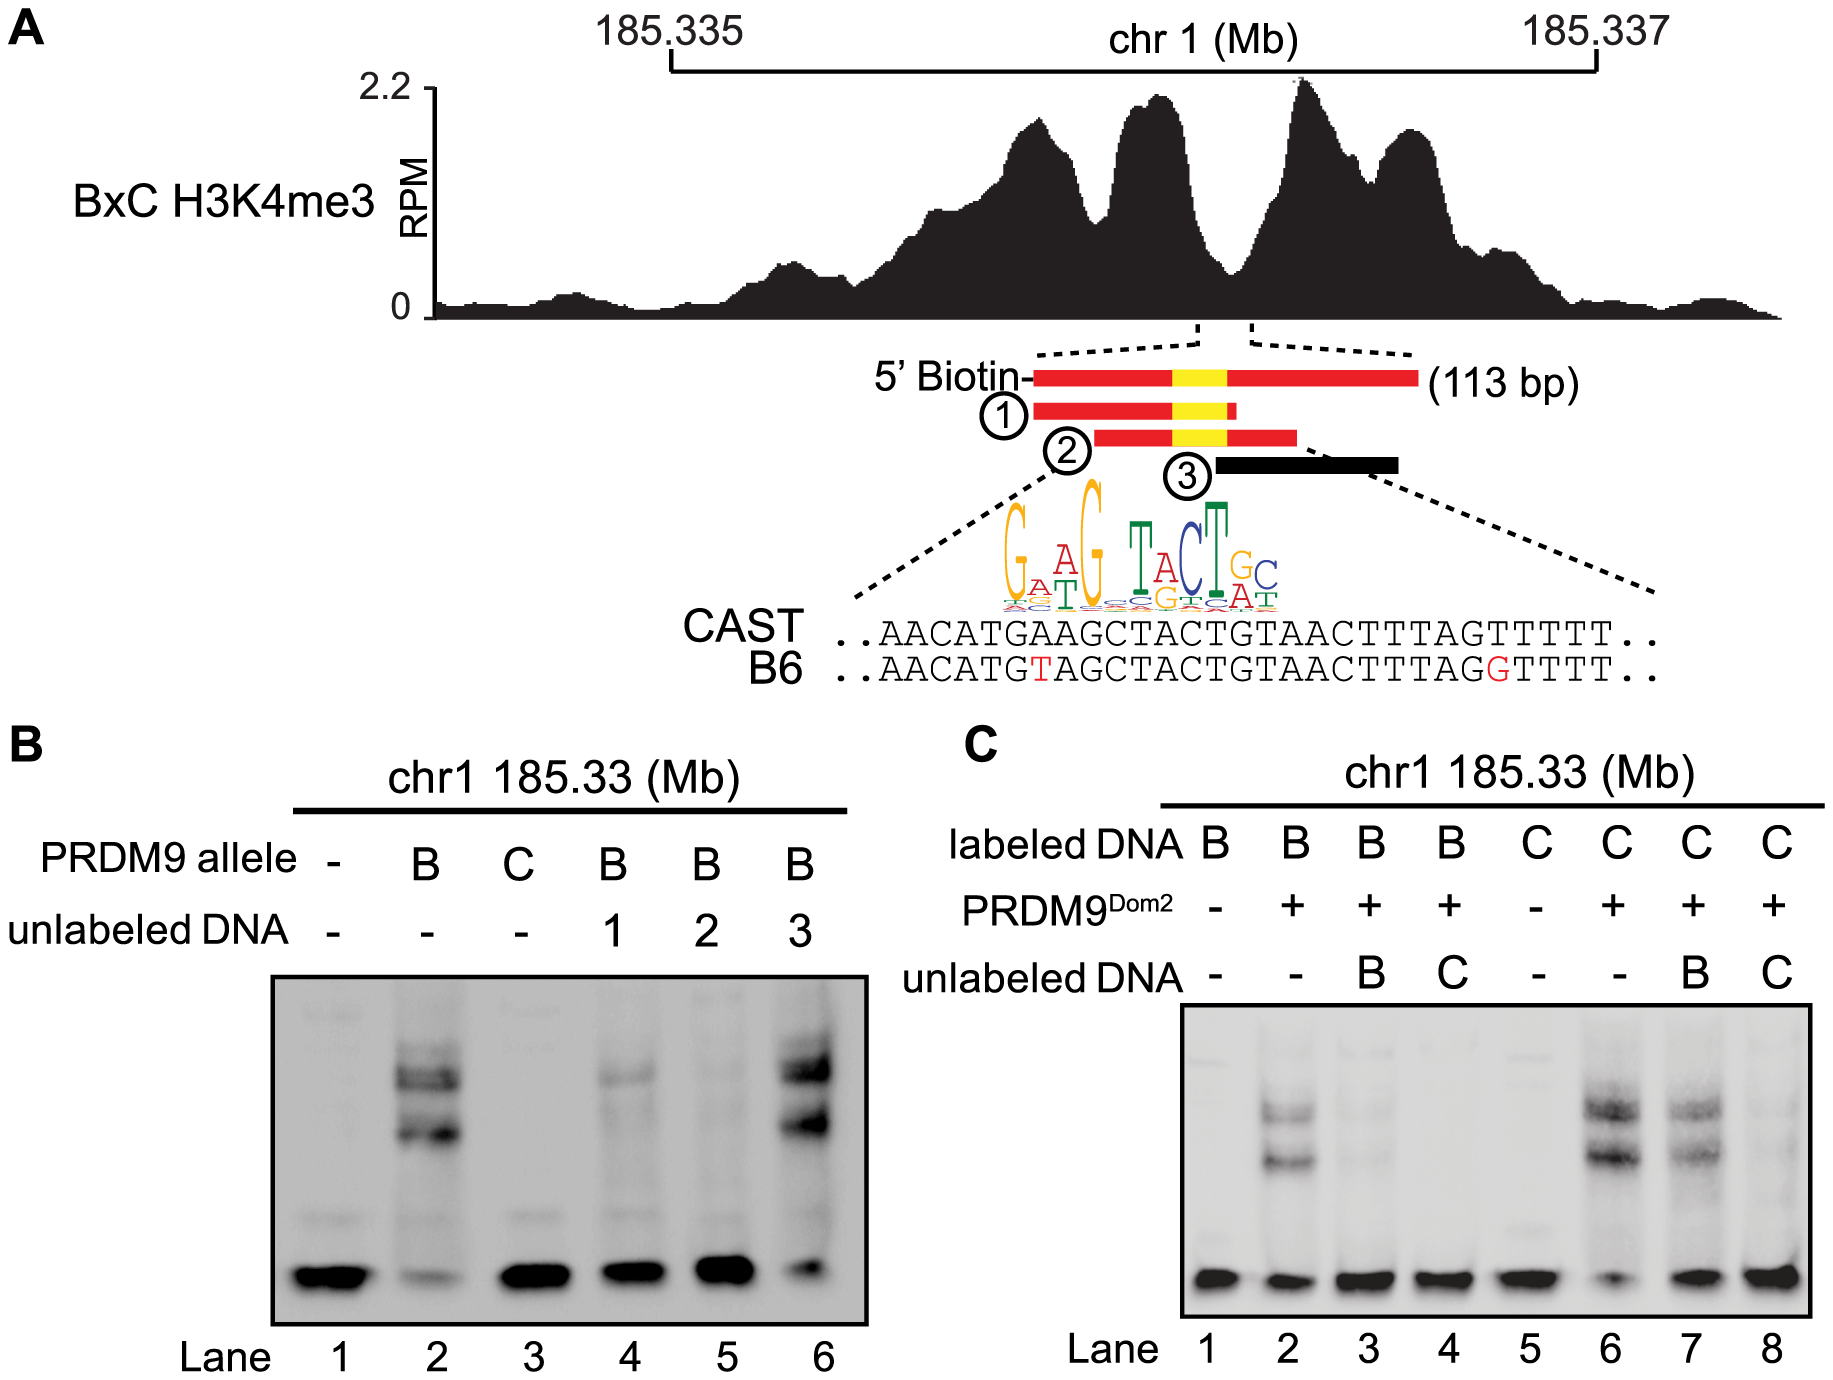 Hotspot haplotype influences PRDM9 binding.